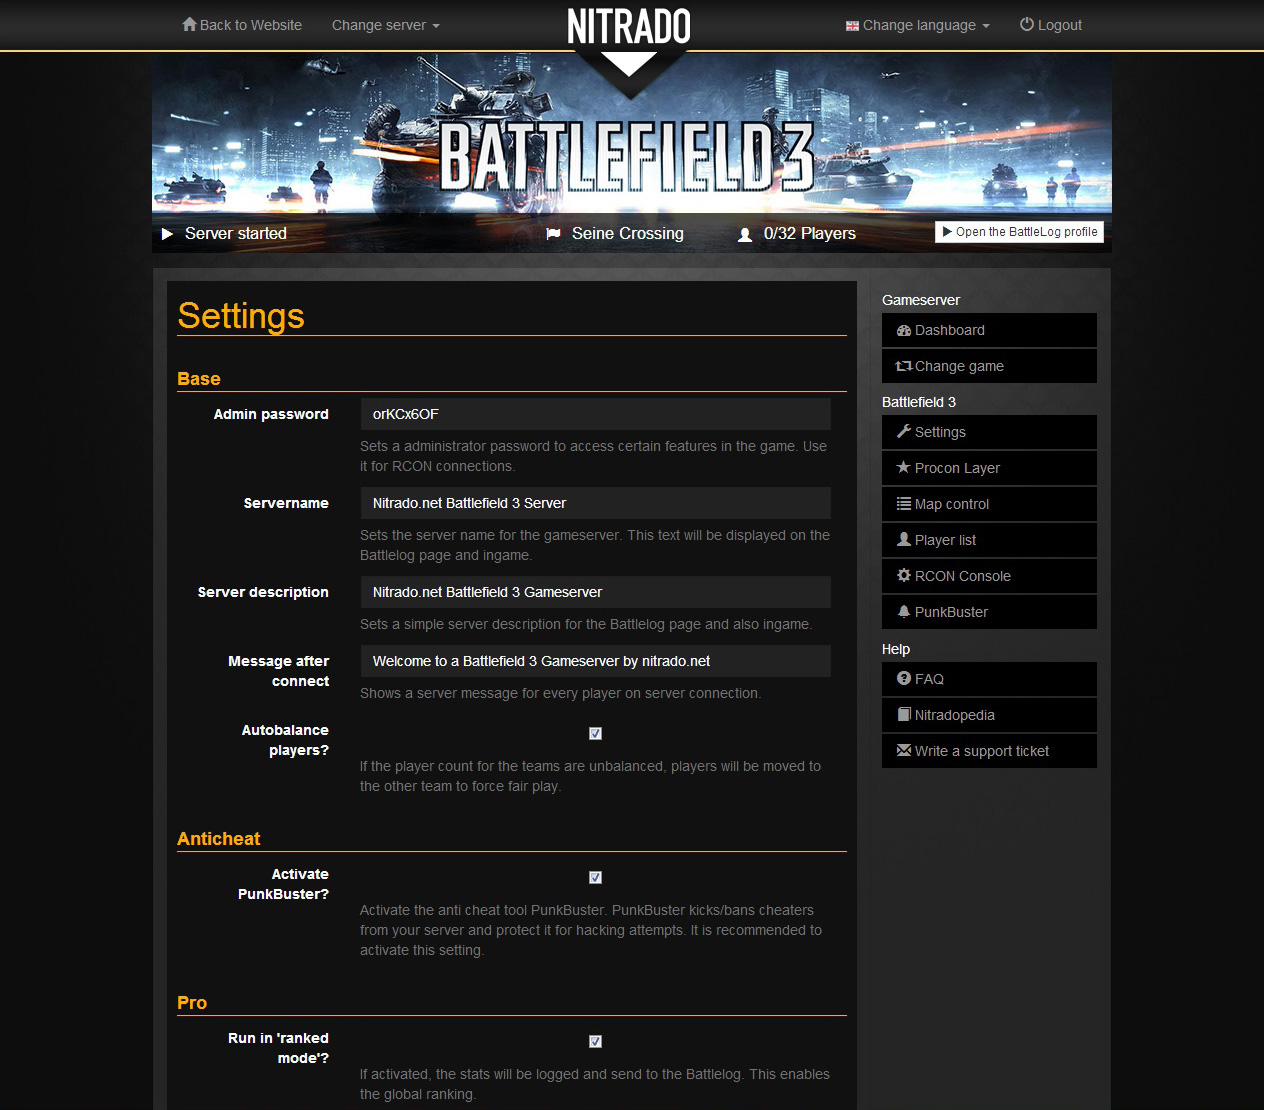 Battlefield 3 rent game server   nitrado net